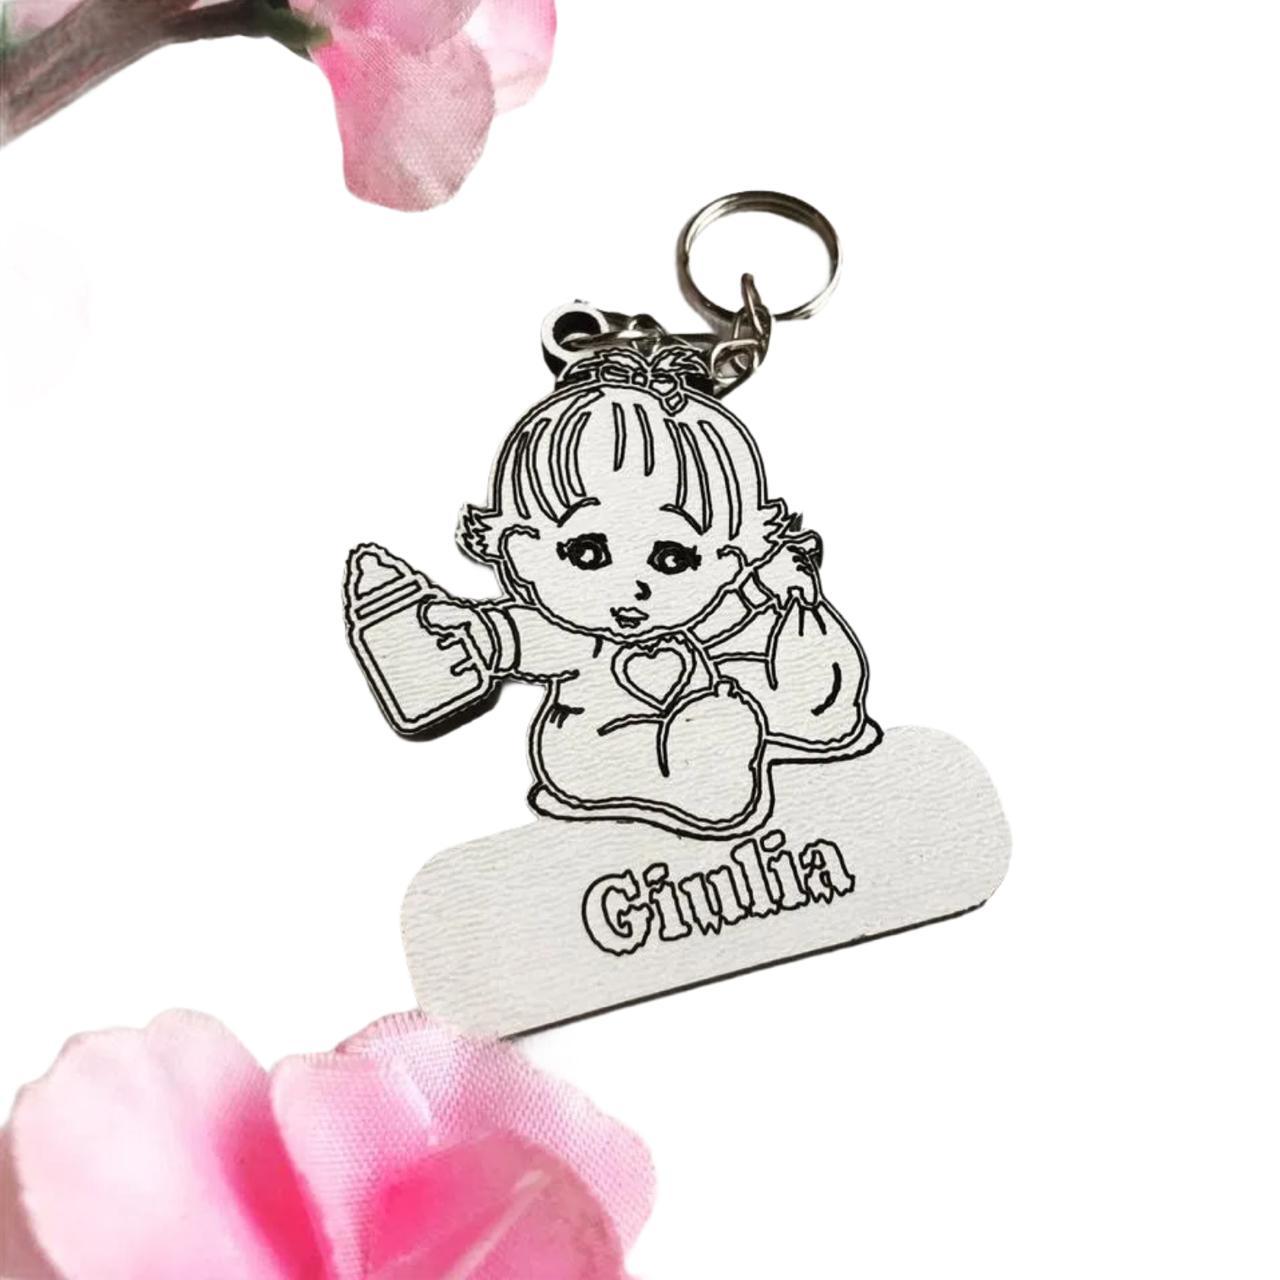 REF. 105 - Chaveiro Bebê menina personalizado Laminado